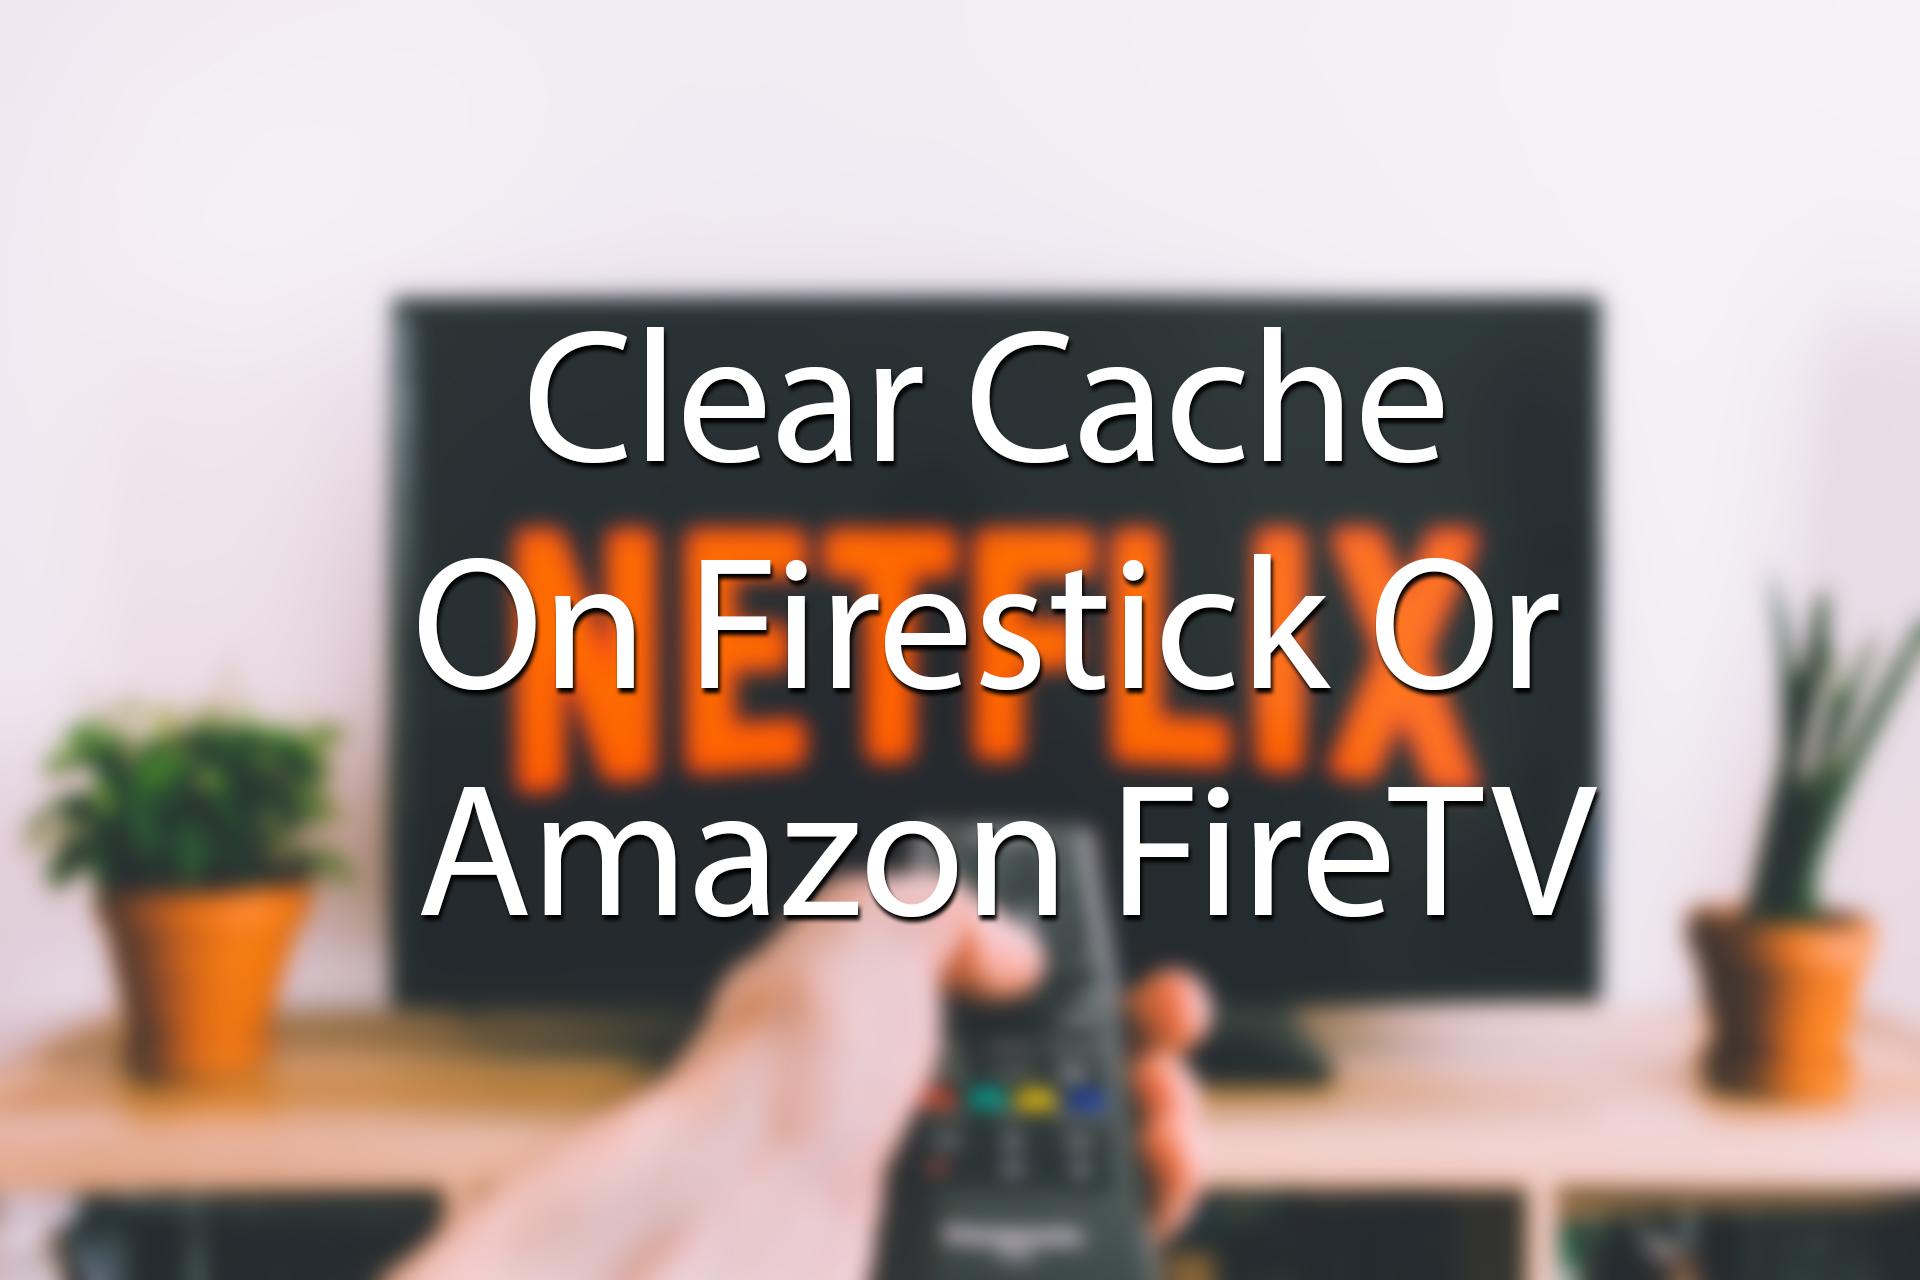 Clear Cache On Firestick Or Amazon FireTV